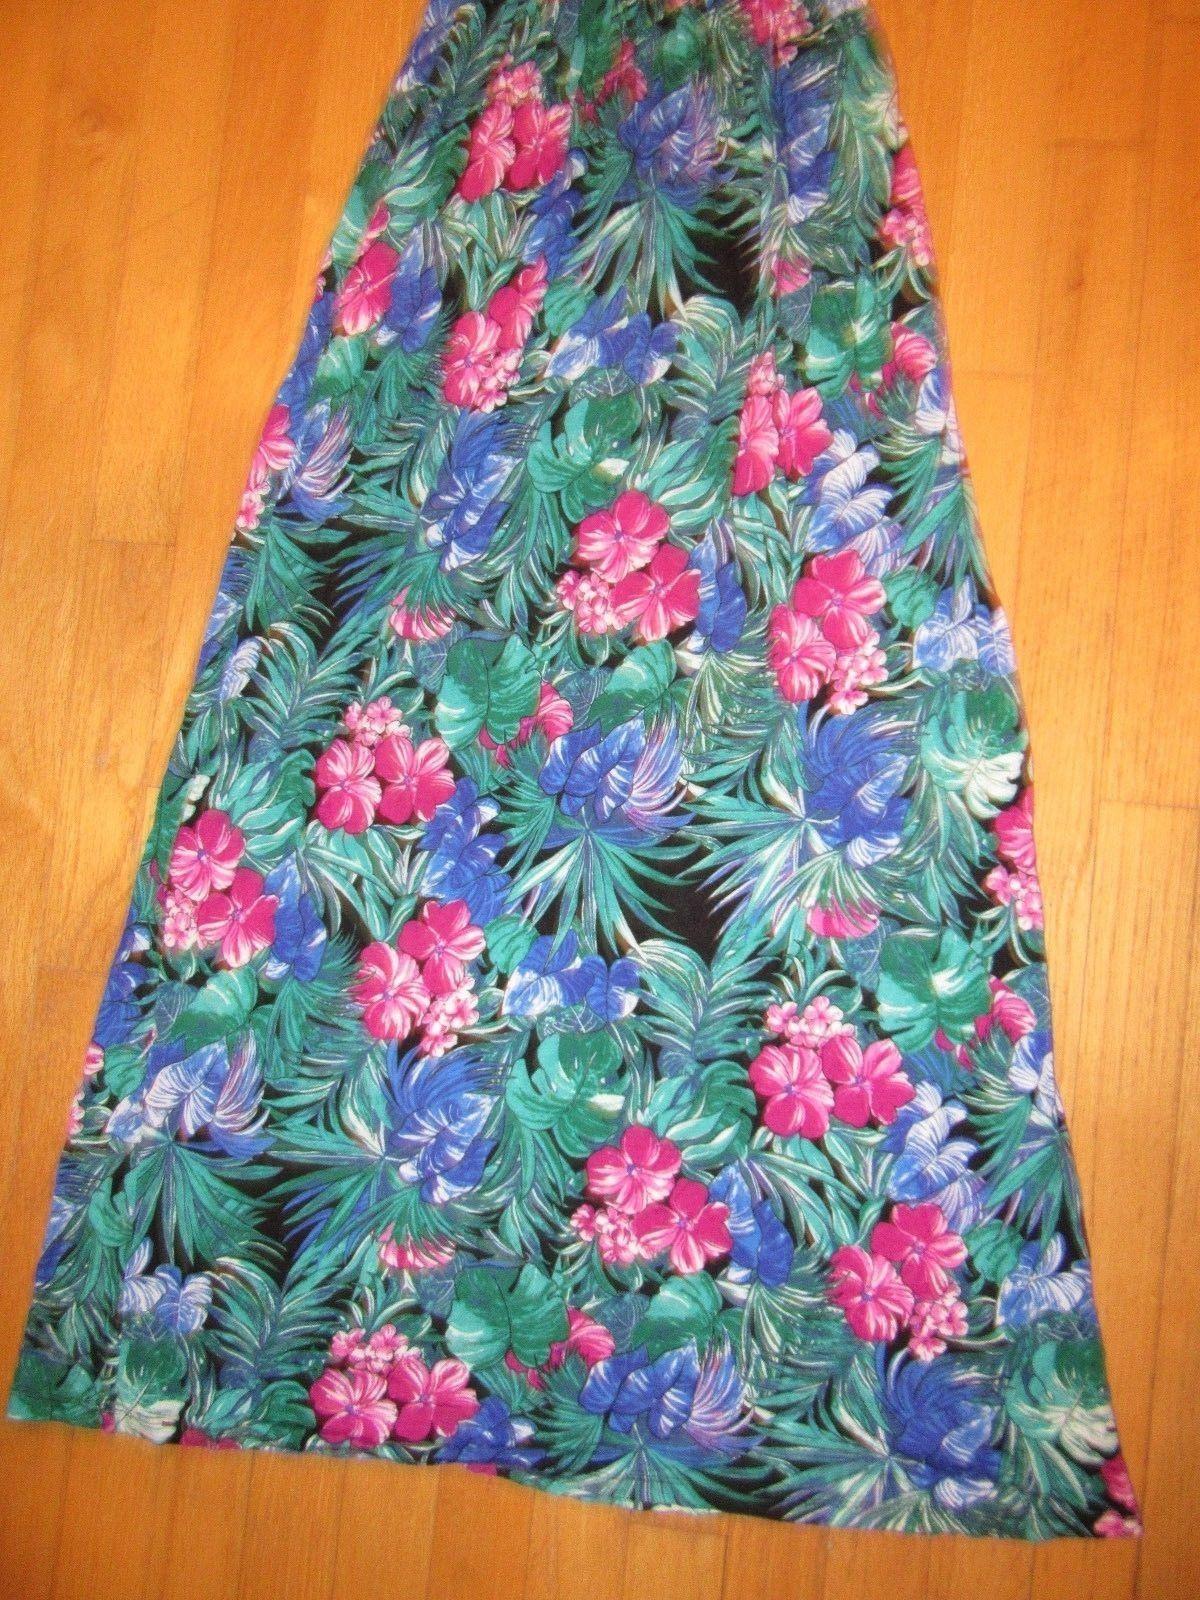 8H/LUSH WOMEN'S SIZE SMALL LONG MAXI DRESS/SPAGHETTI STRAP/FLORAL/GREENS!